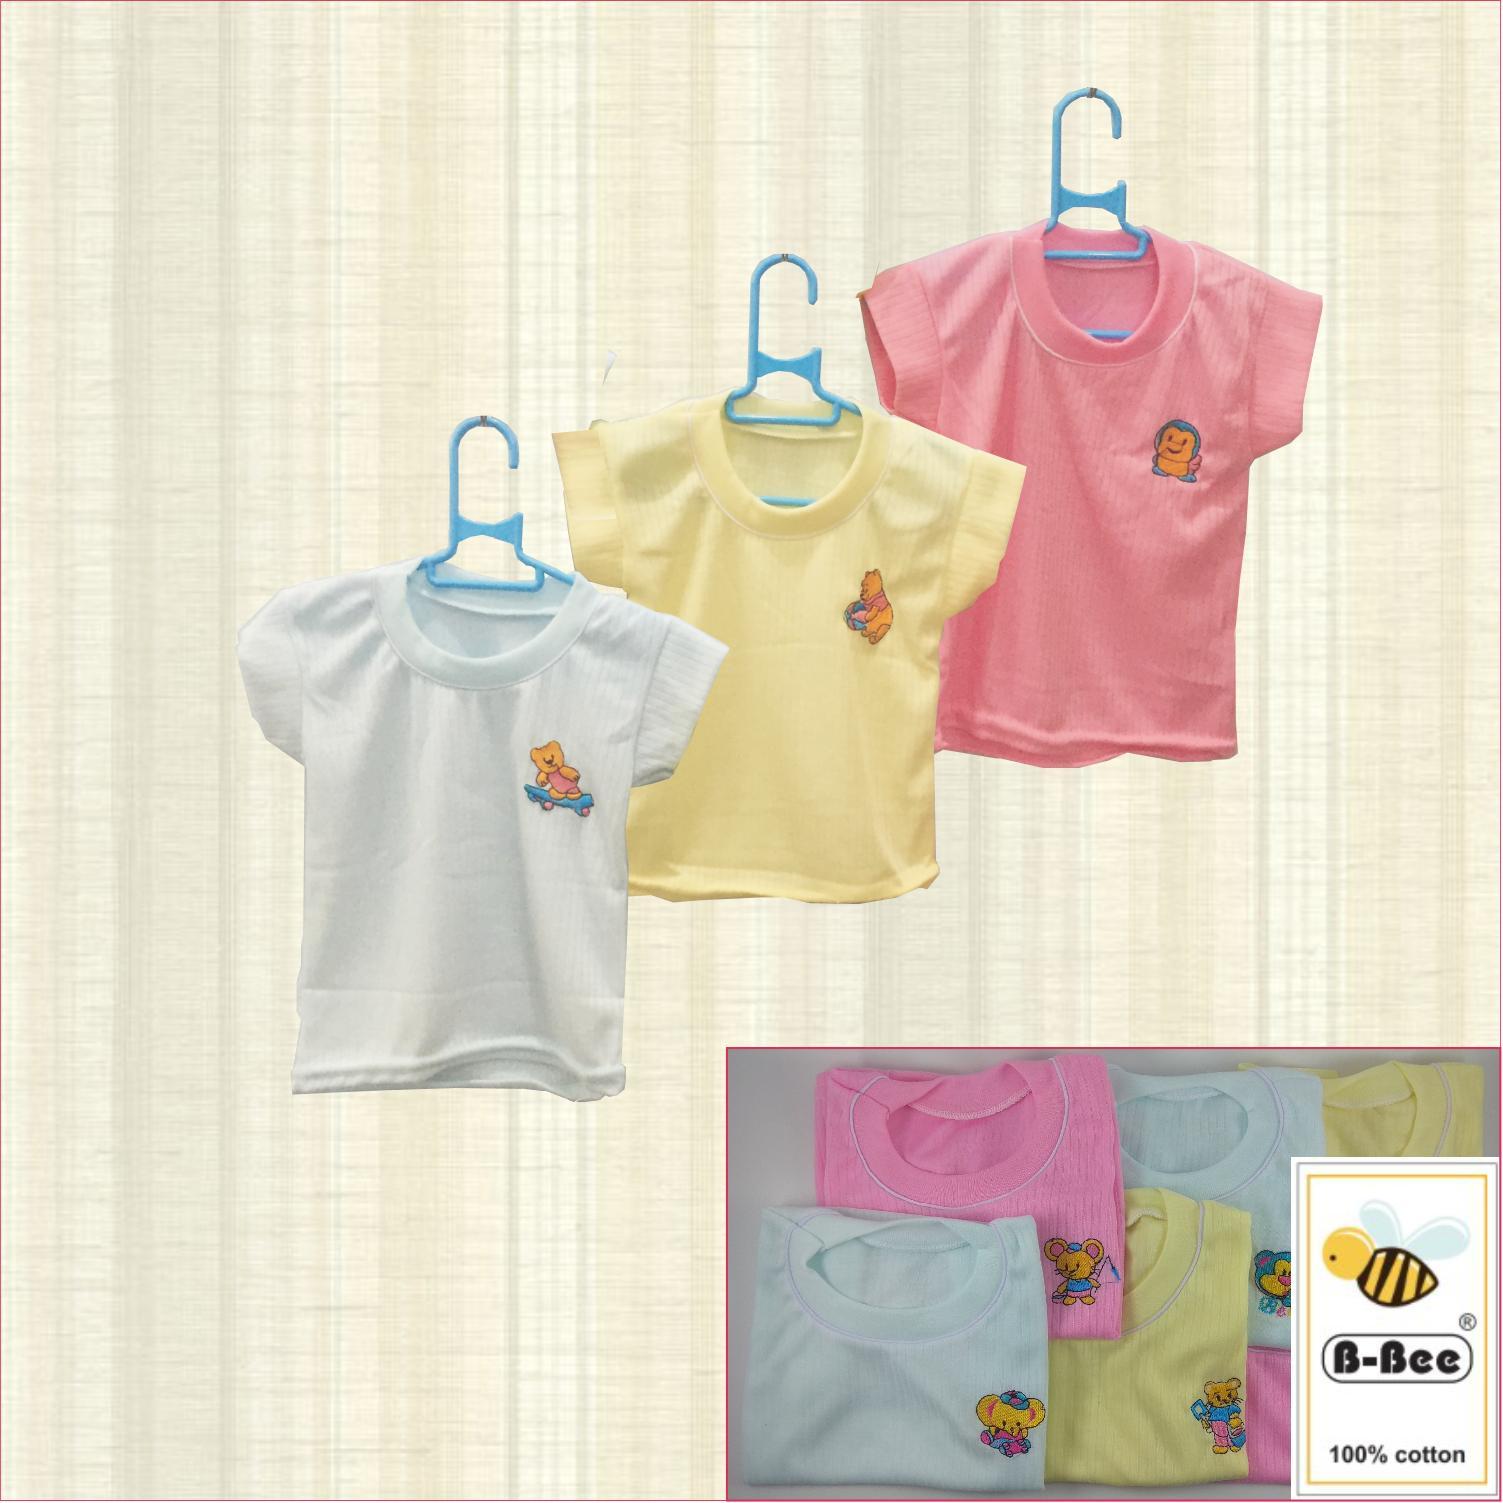 Luvita Baju Bayi Lengan Celana Panjang Polos M L 1 Set Daftar Oblong Iol Anak Pendek B Bee